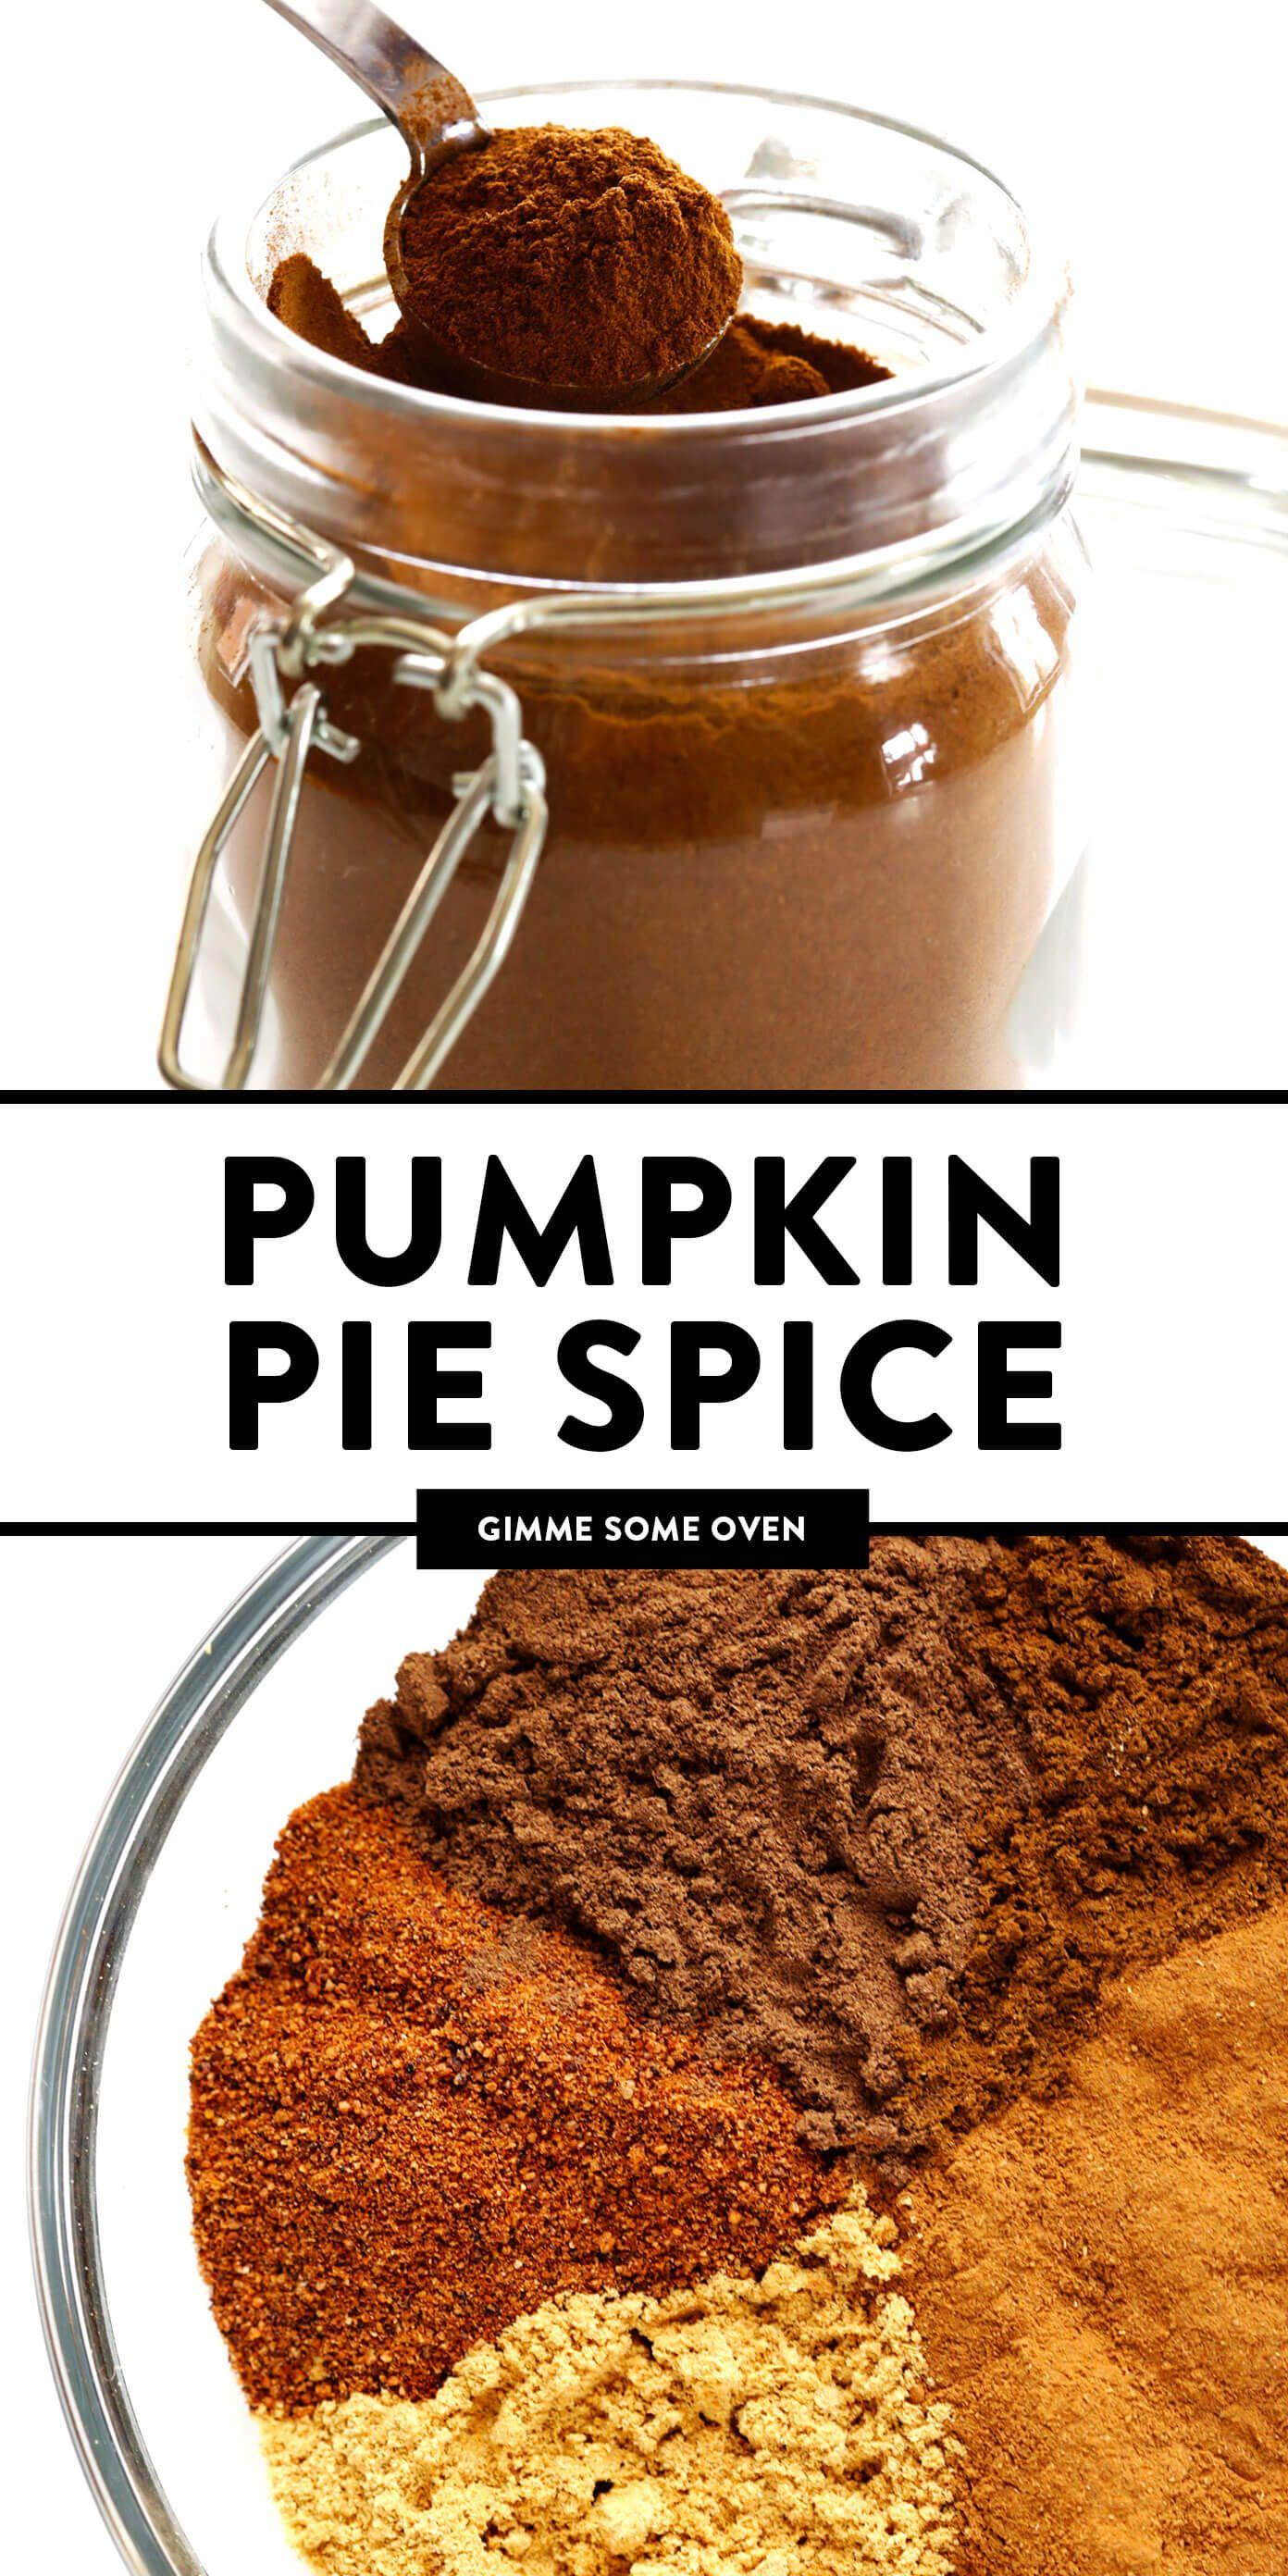 Pumpkin Pie Spice Recipe Homemade pumpkin pie spice